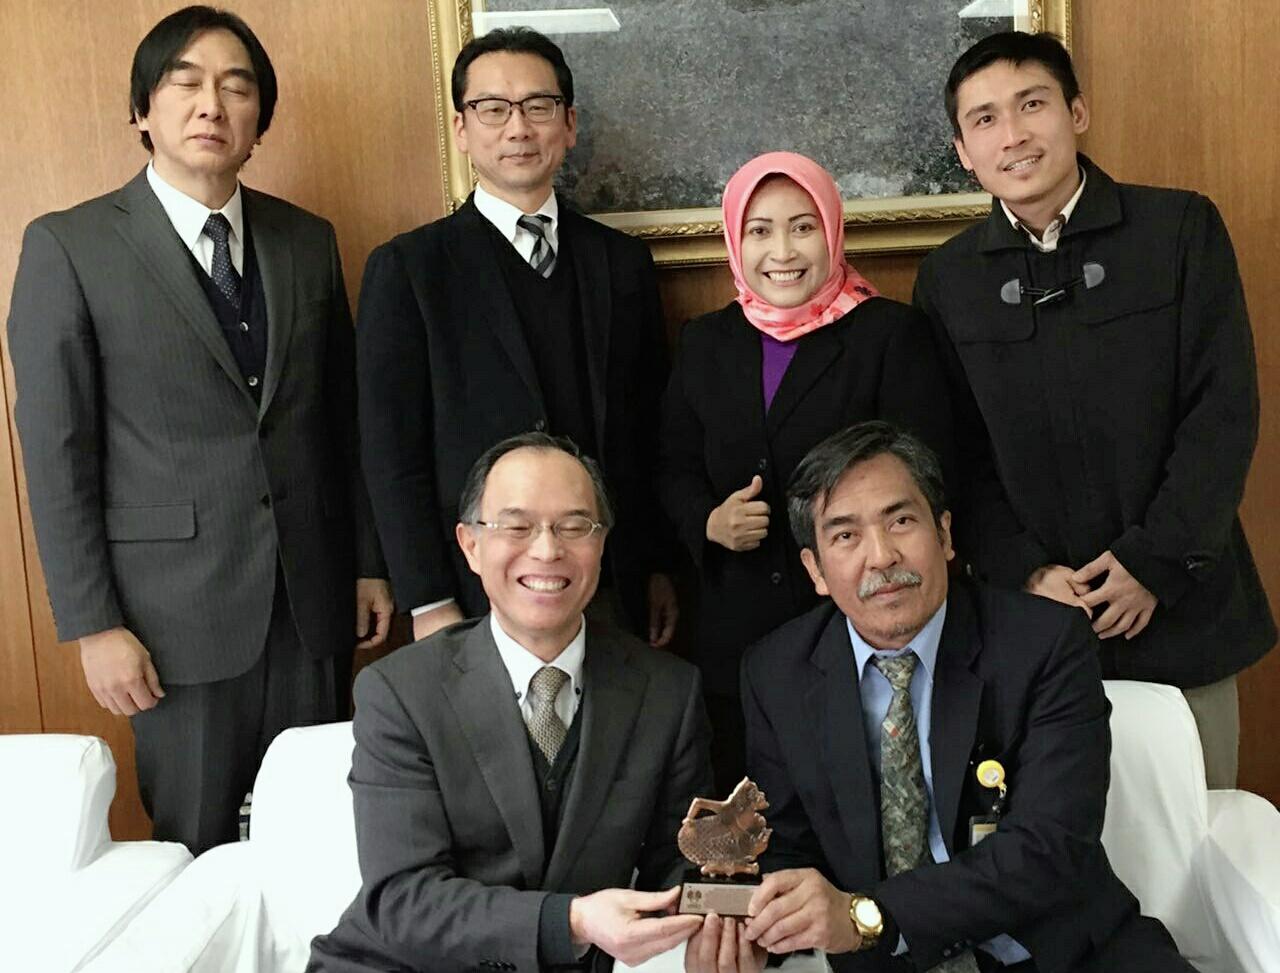 Dosen Biologi UNNES Guest Lecture Di Jepang